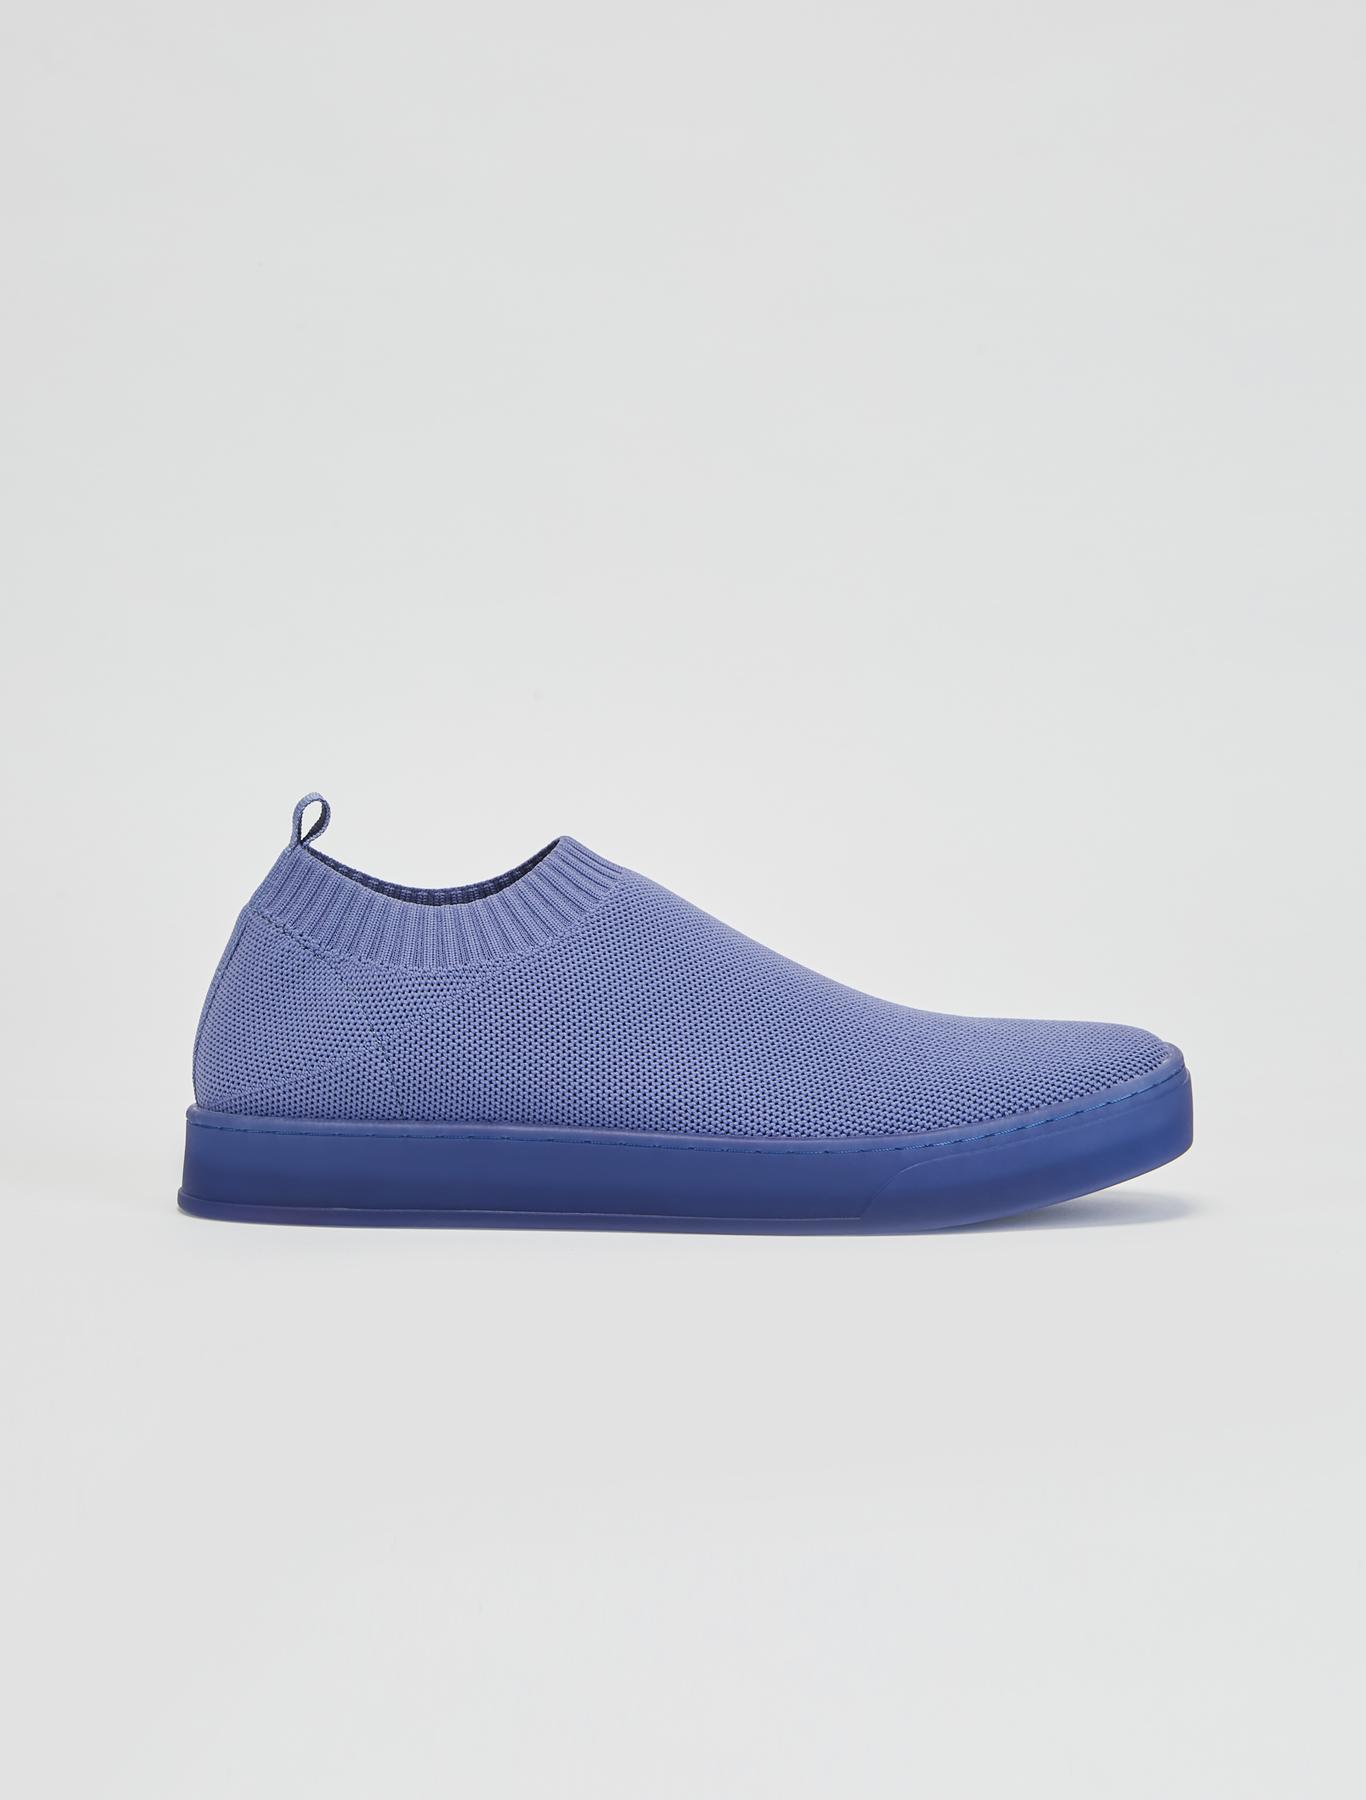 OYA sock sneakers, air force blue - Max\u0026Co.